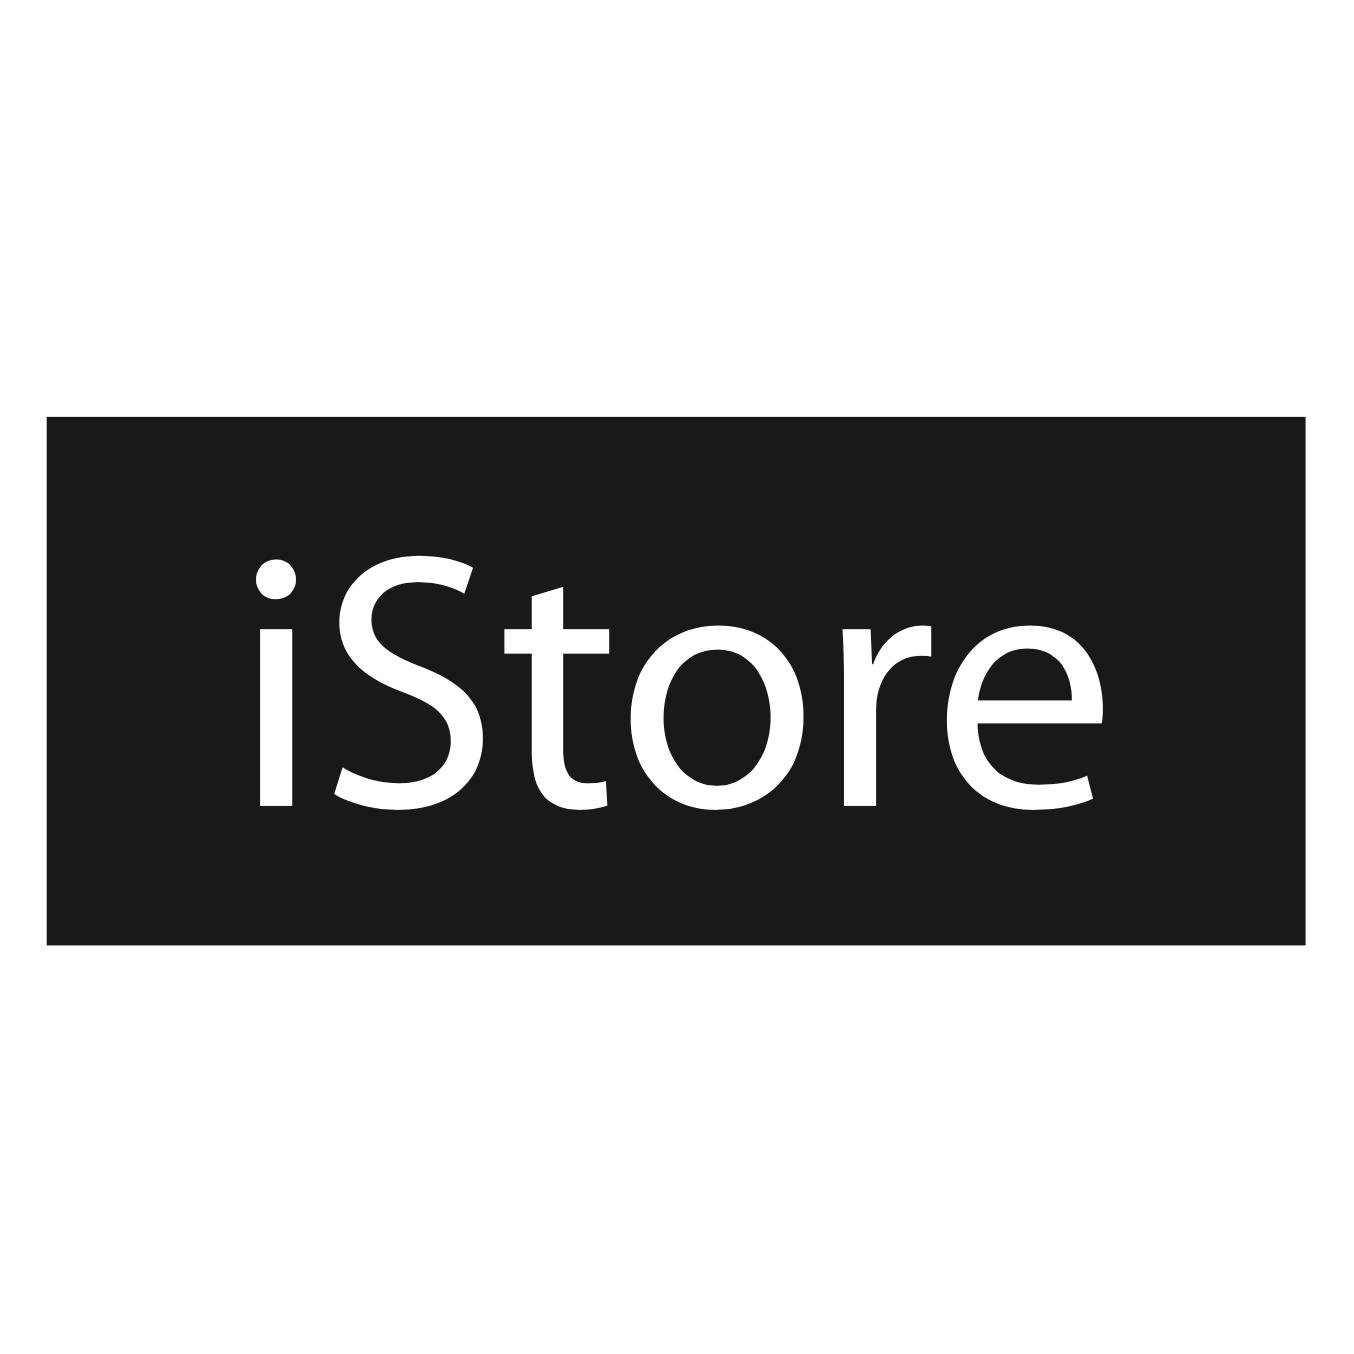 iPhone X Silicone Case - Lemonade